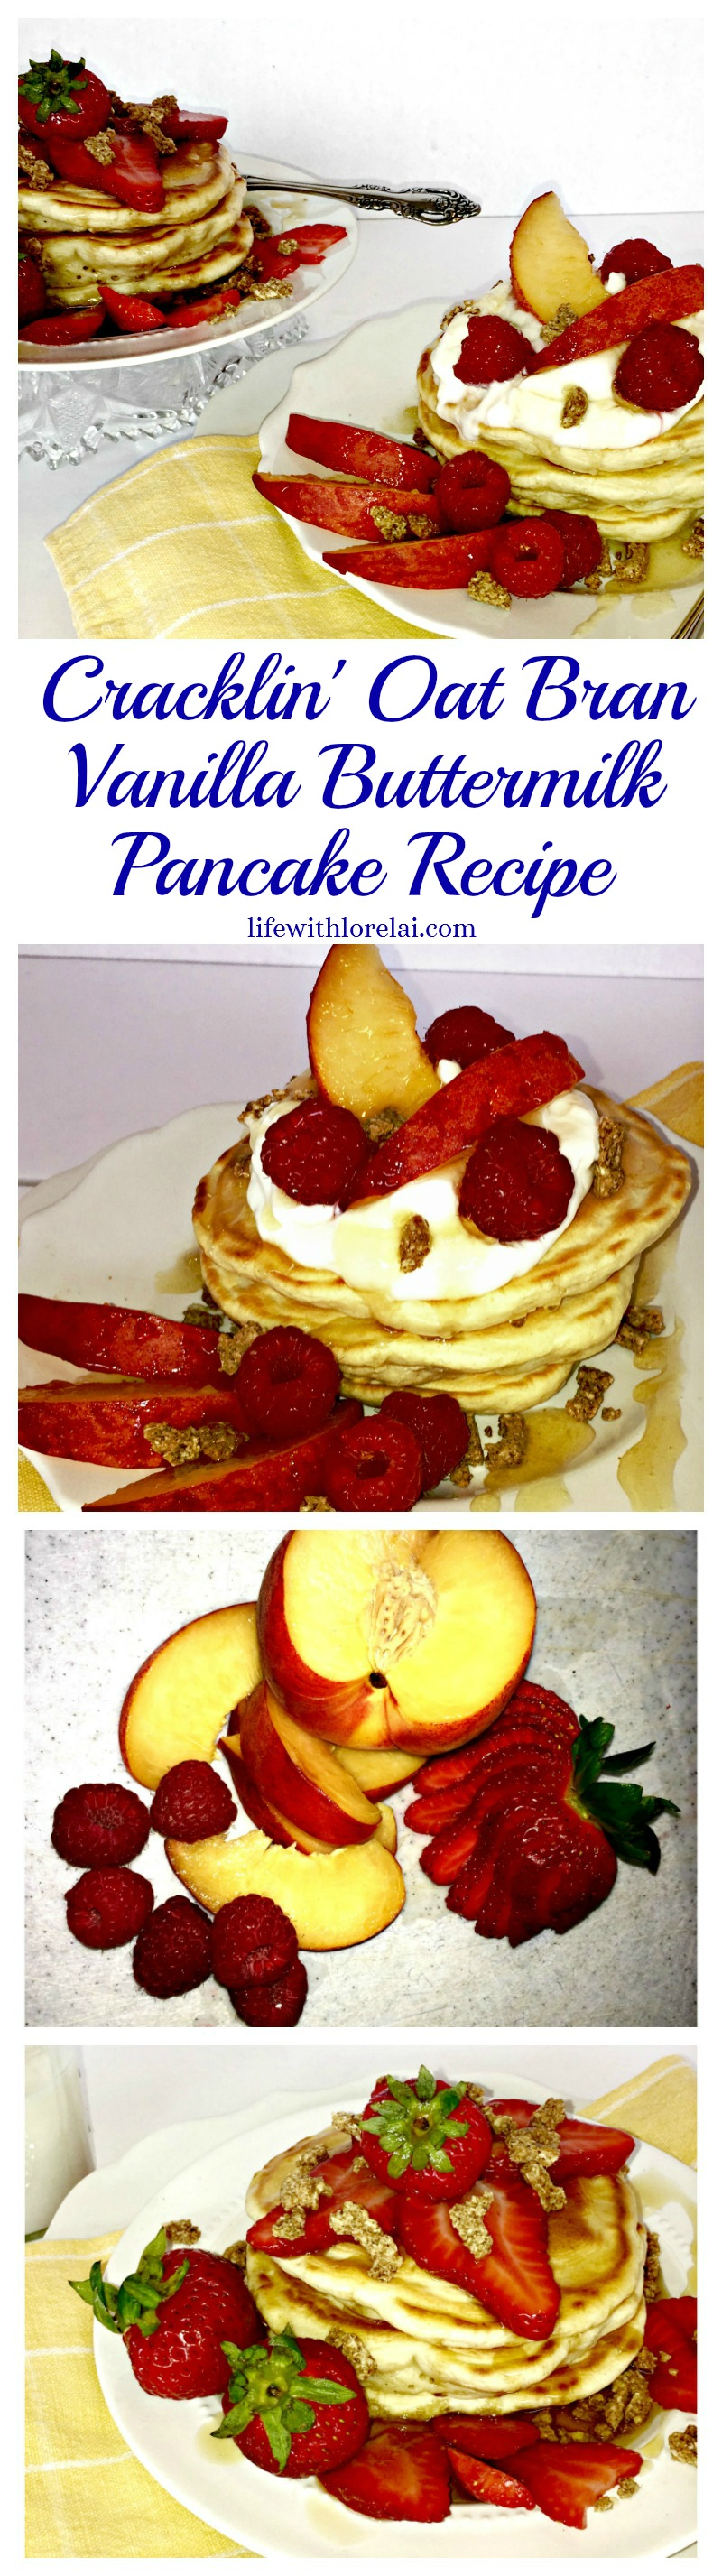 Cracklin'-Oat-Bran-Vanilla-Buttermilk-Pancakes-Recipe-Long-Pin-Life With Lorelai